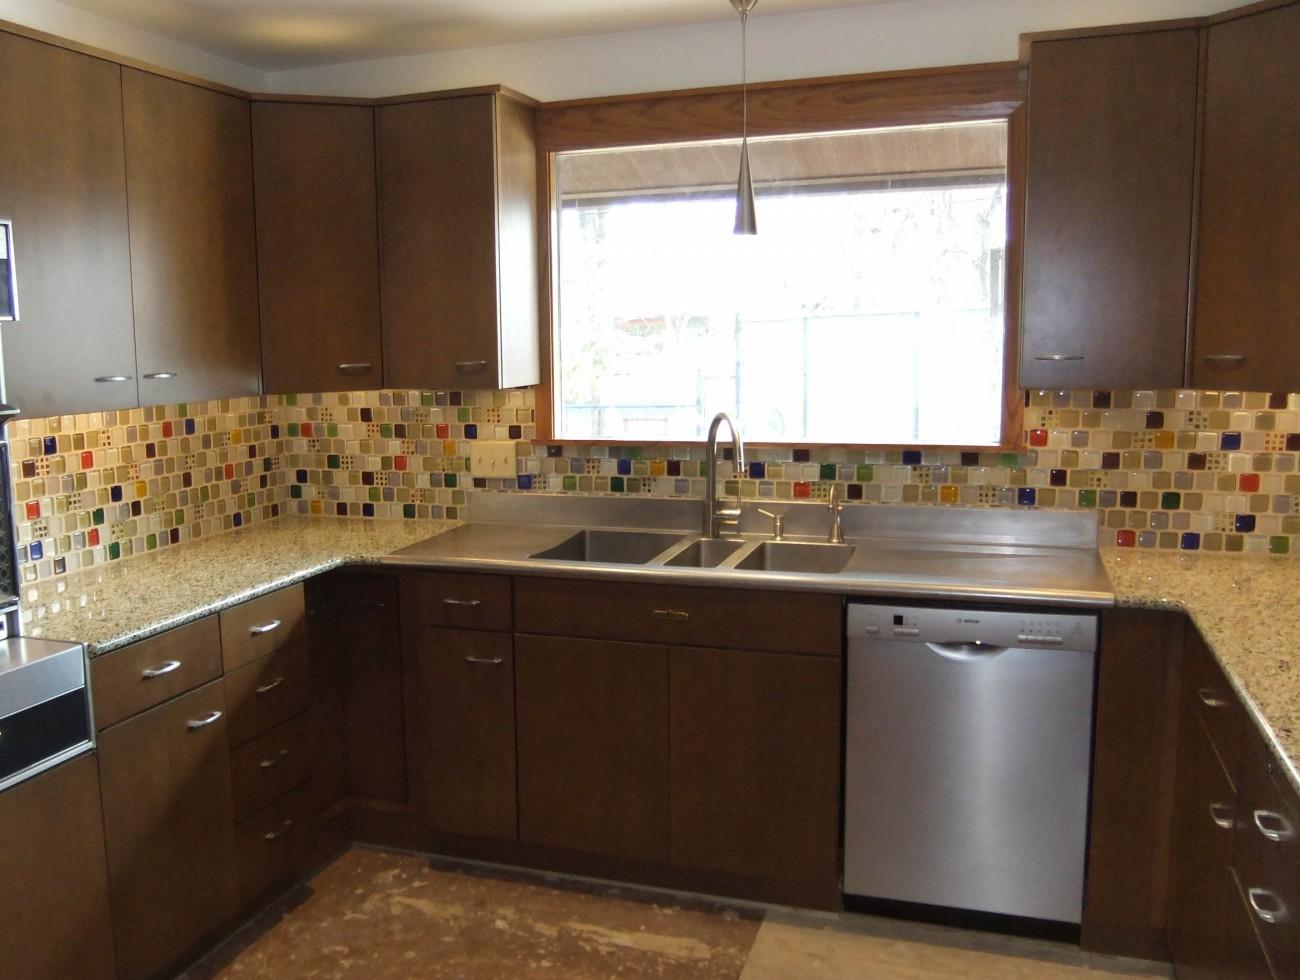 Custom Bubble Tile Backsplash In Mid Century Modern Kitchen